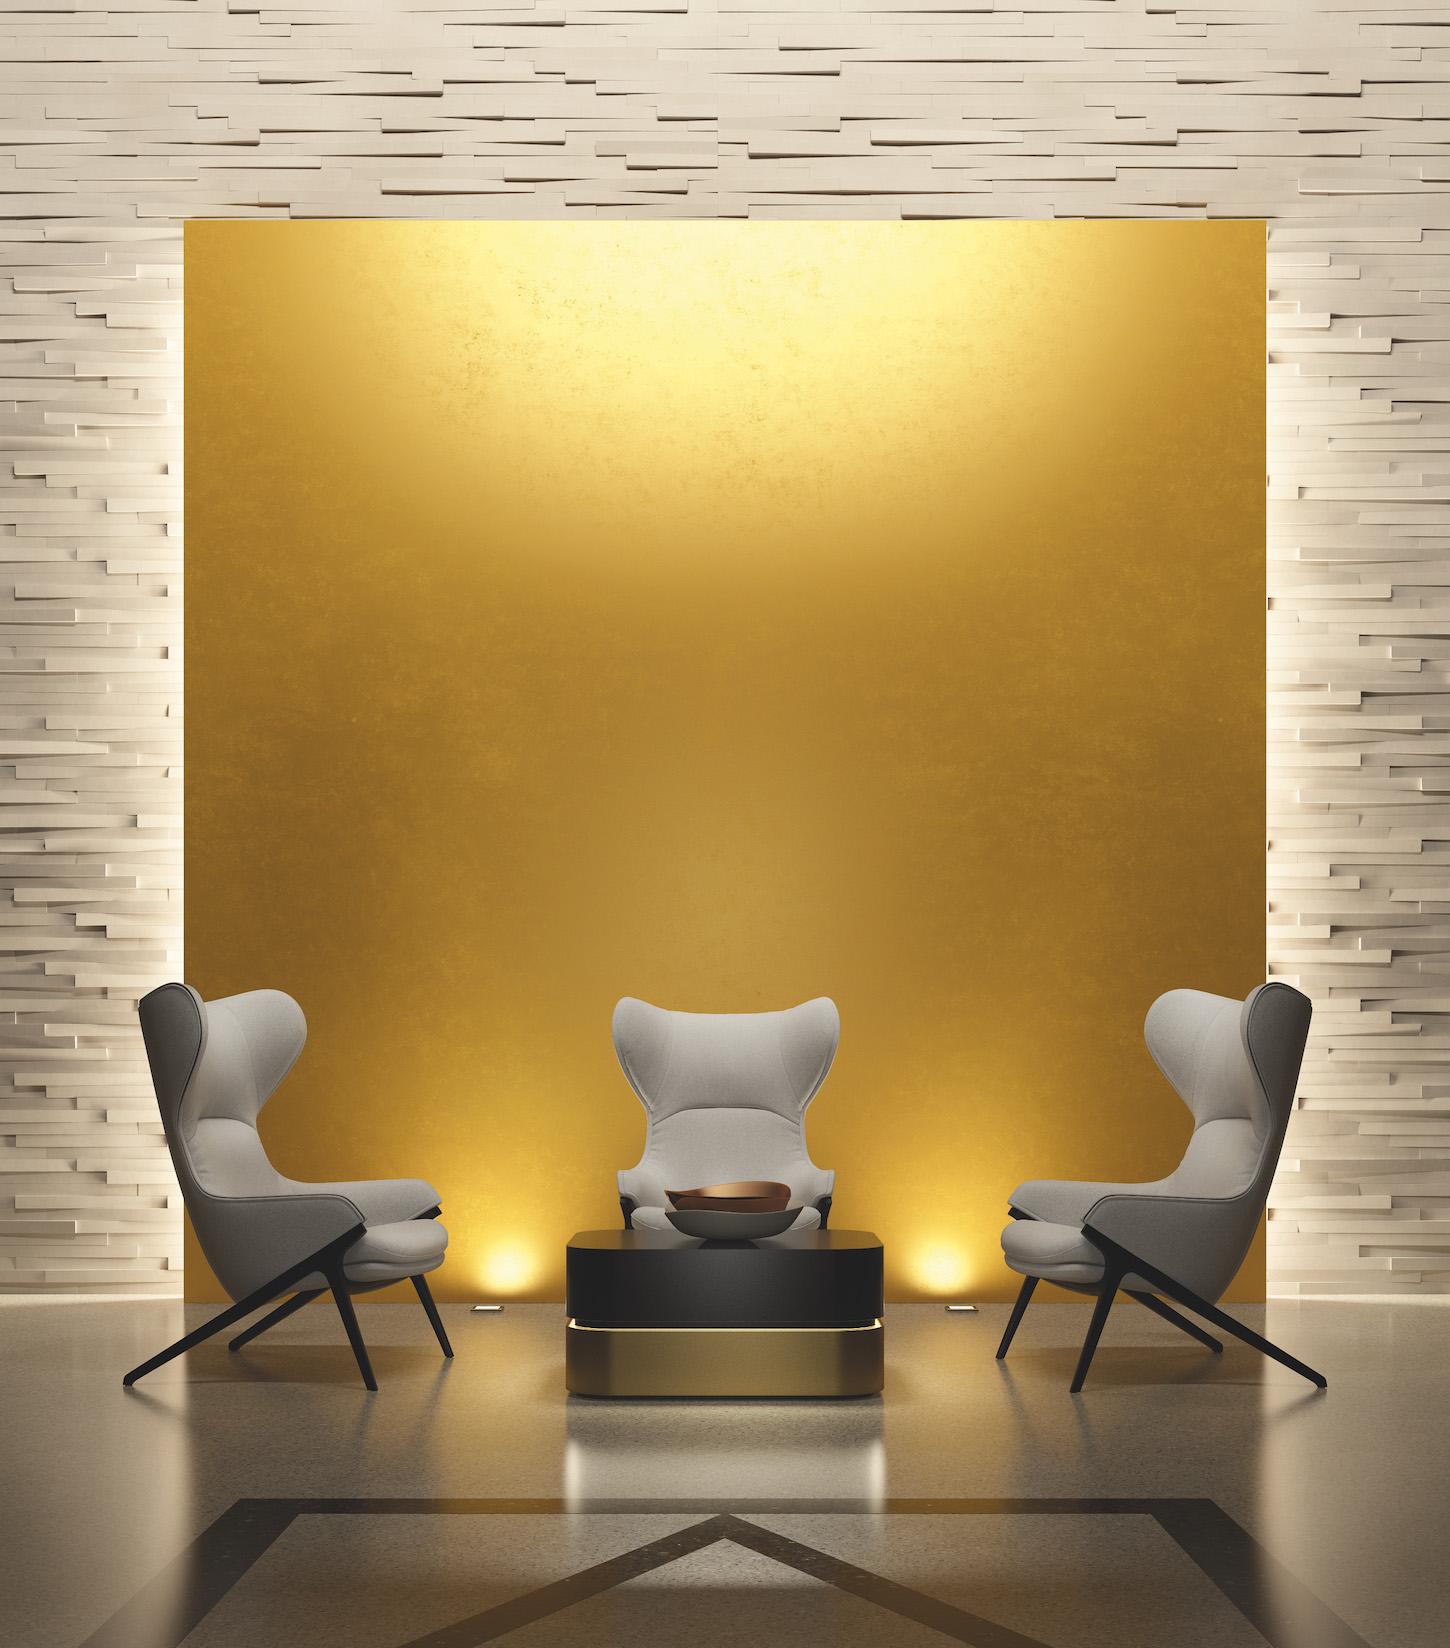 Colorificio san marco la luminosit che esalta gli spazi for Colorificio san marco